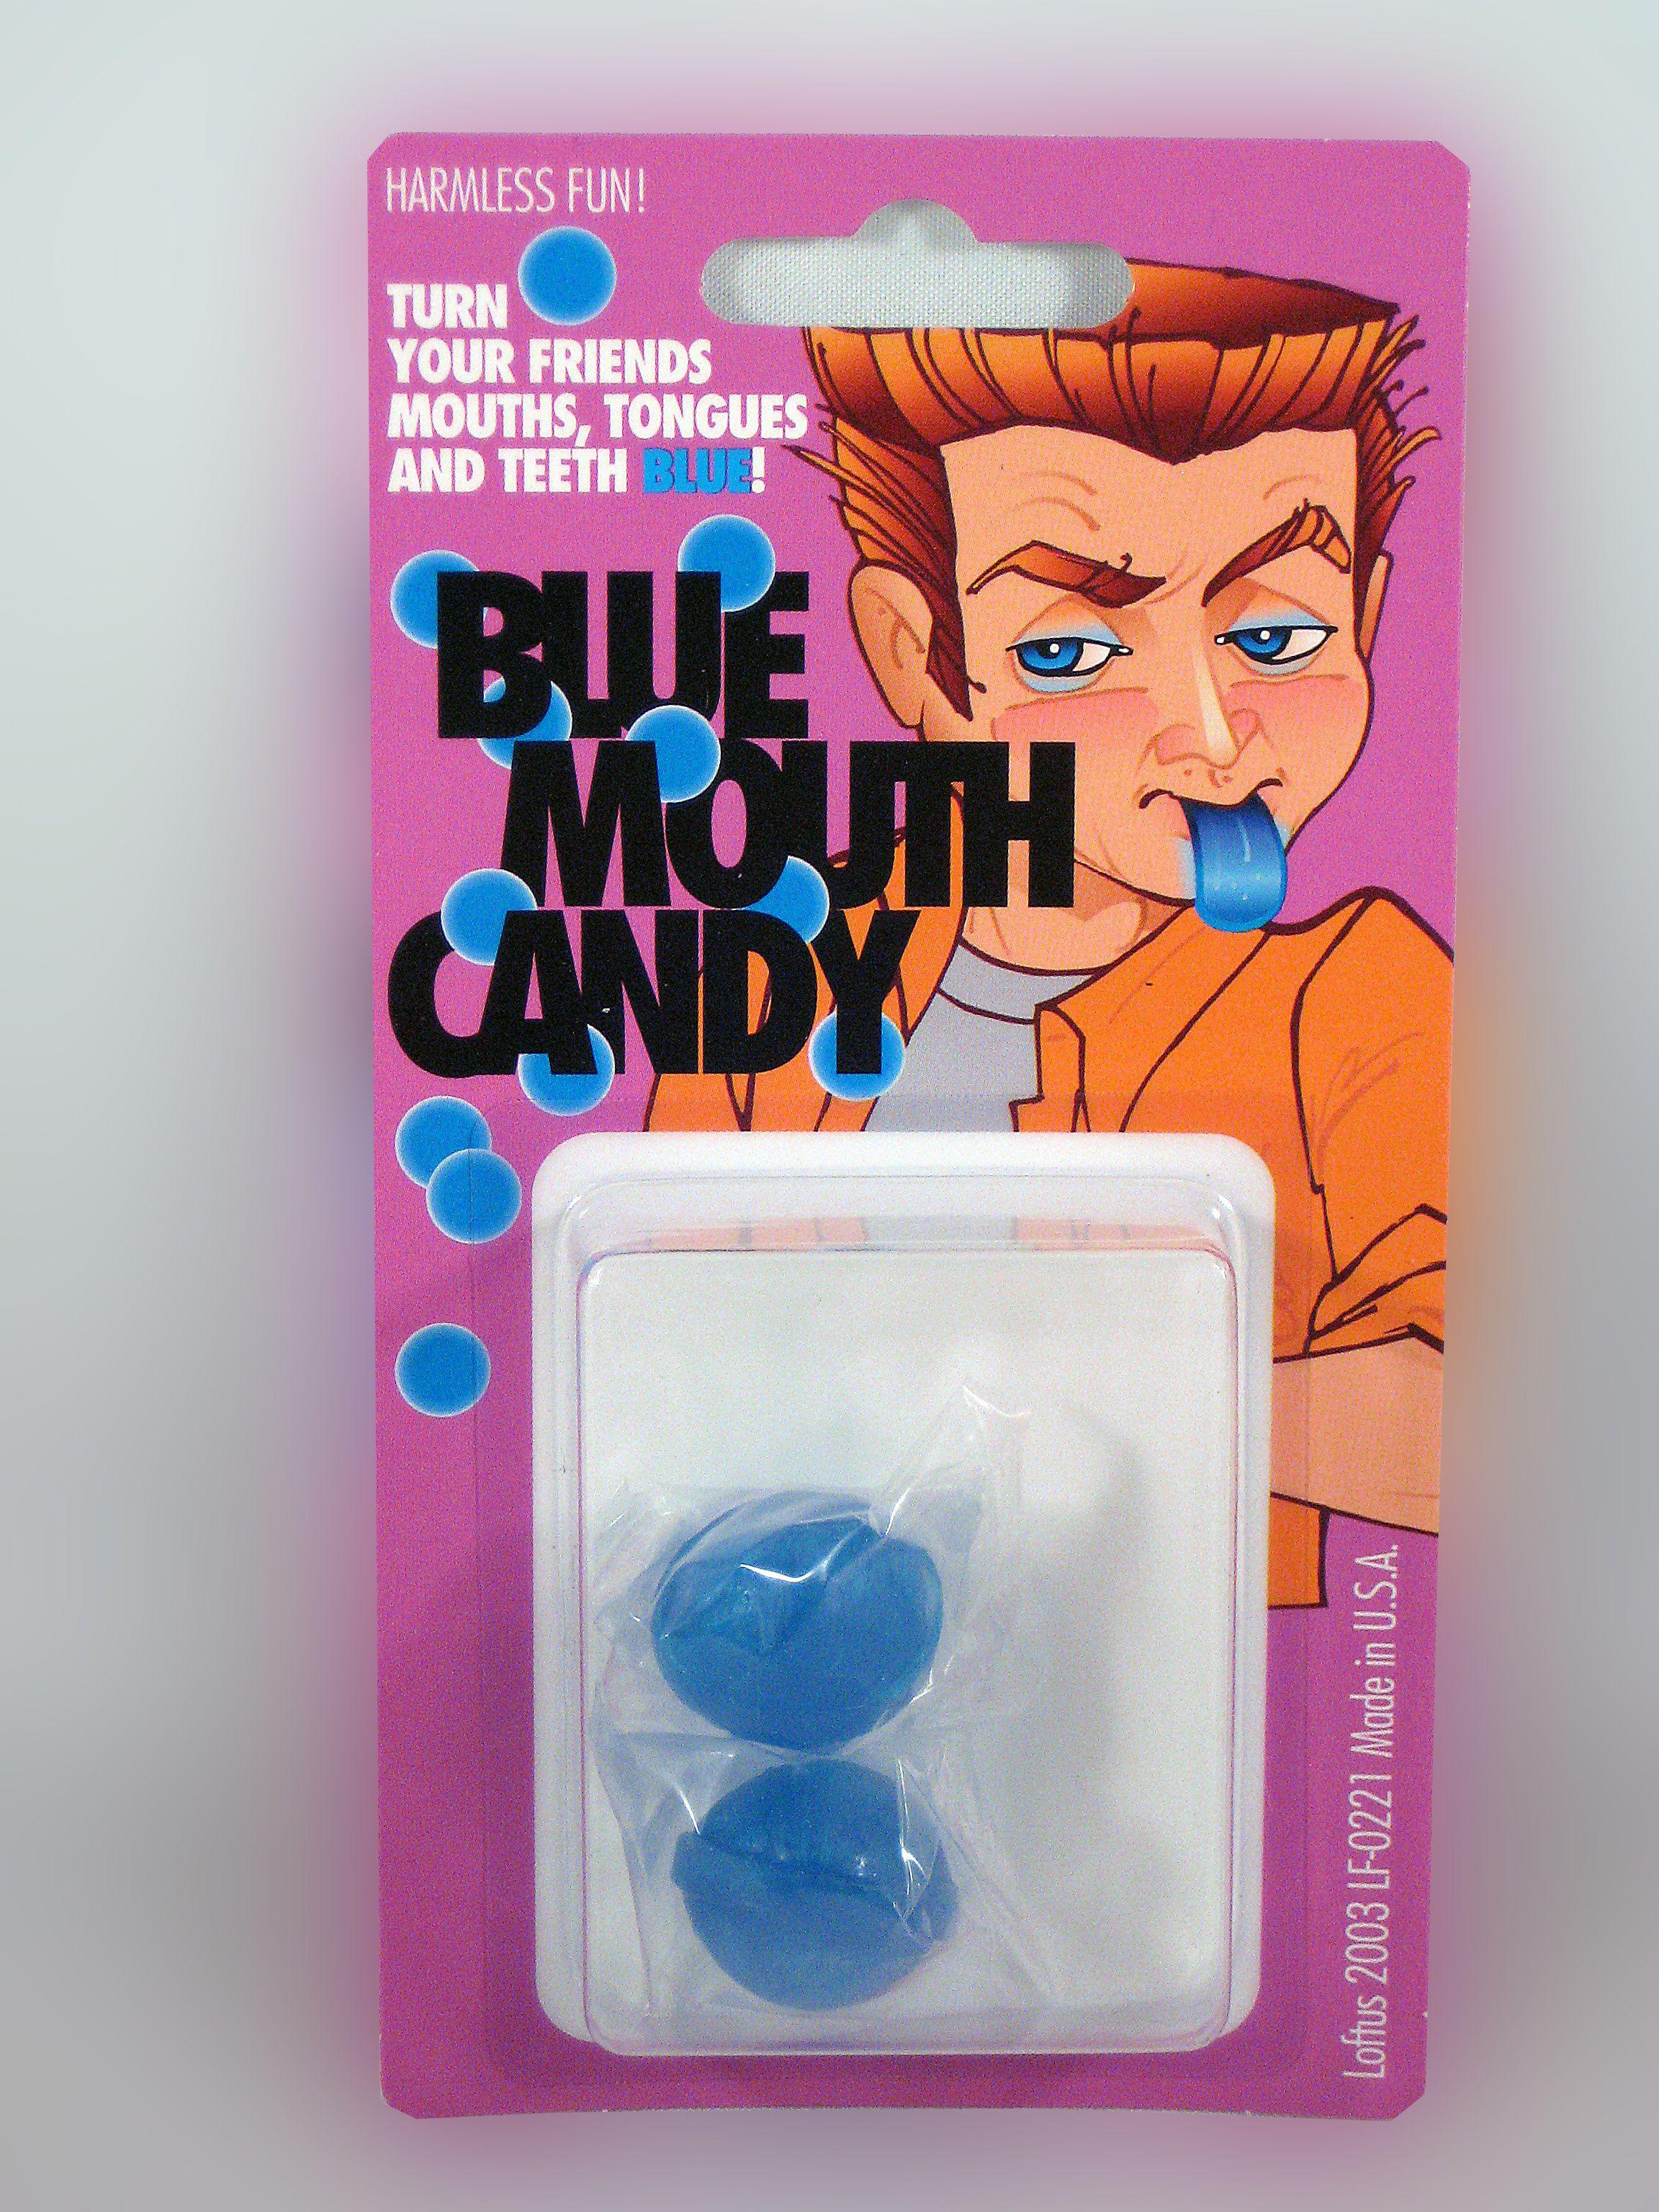 Blue Mouth Candy Funny April Fools Pranks School Pranks Pranks